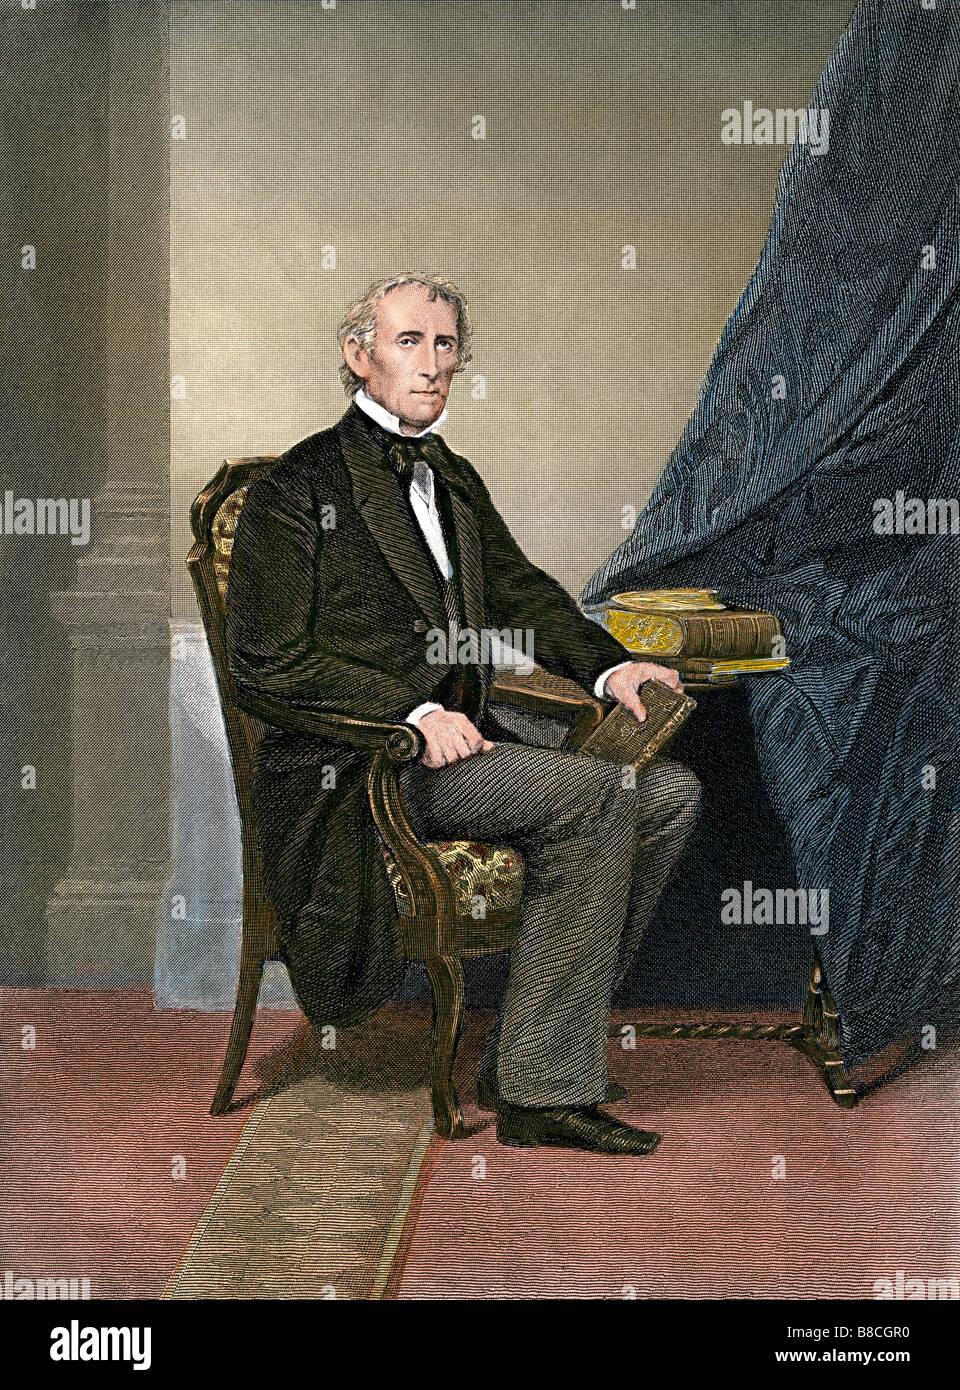 US President John Tyler. Hand-colored steel engraving - Stock Image